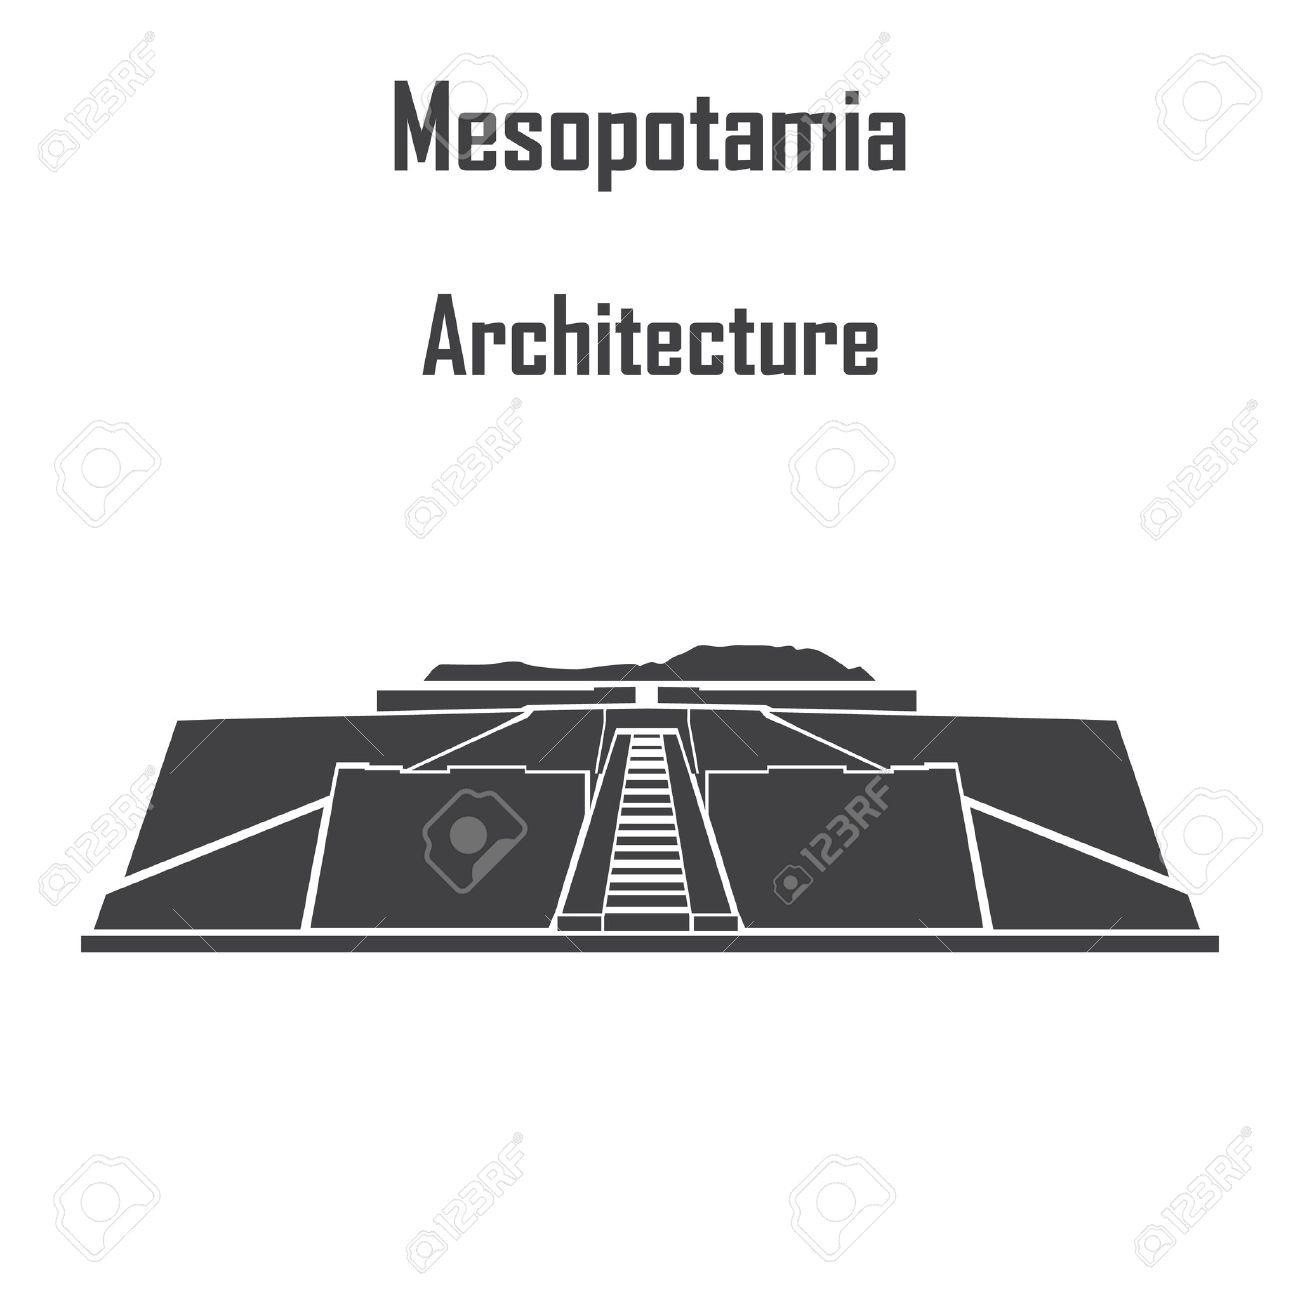 Mesopotamia architecture, ziggurat icon vector. - 50556707